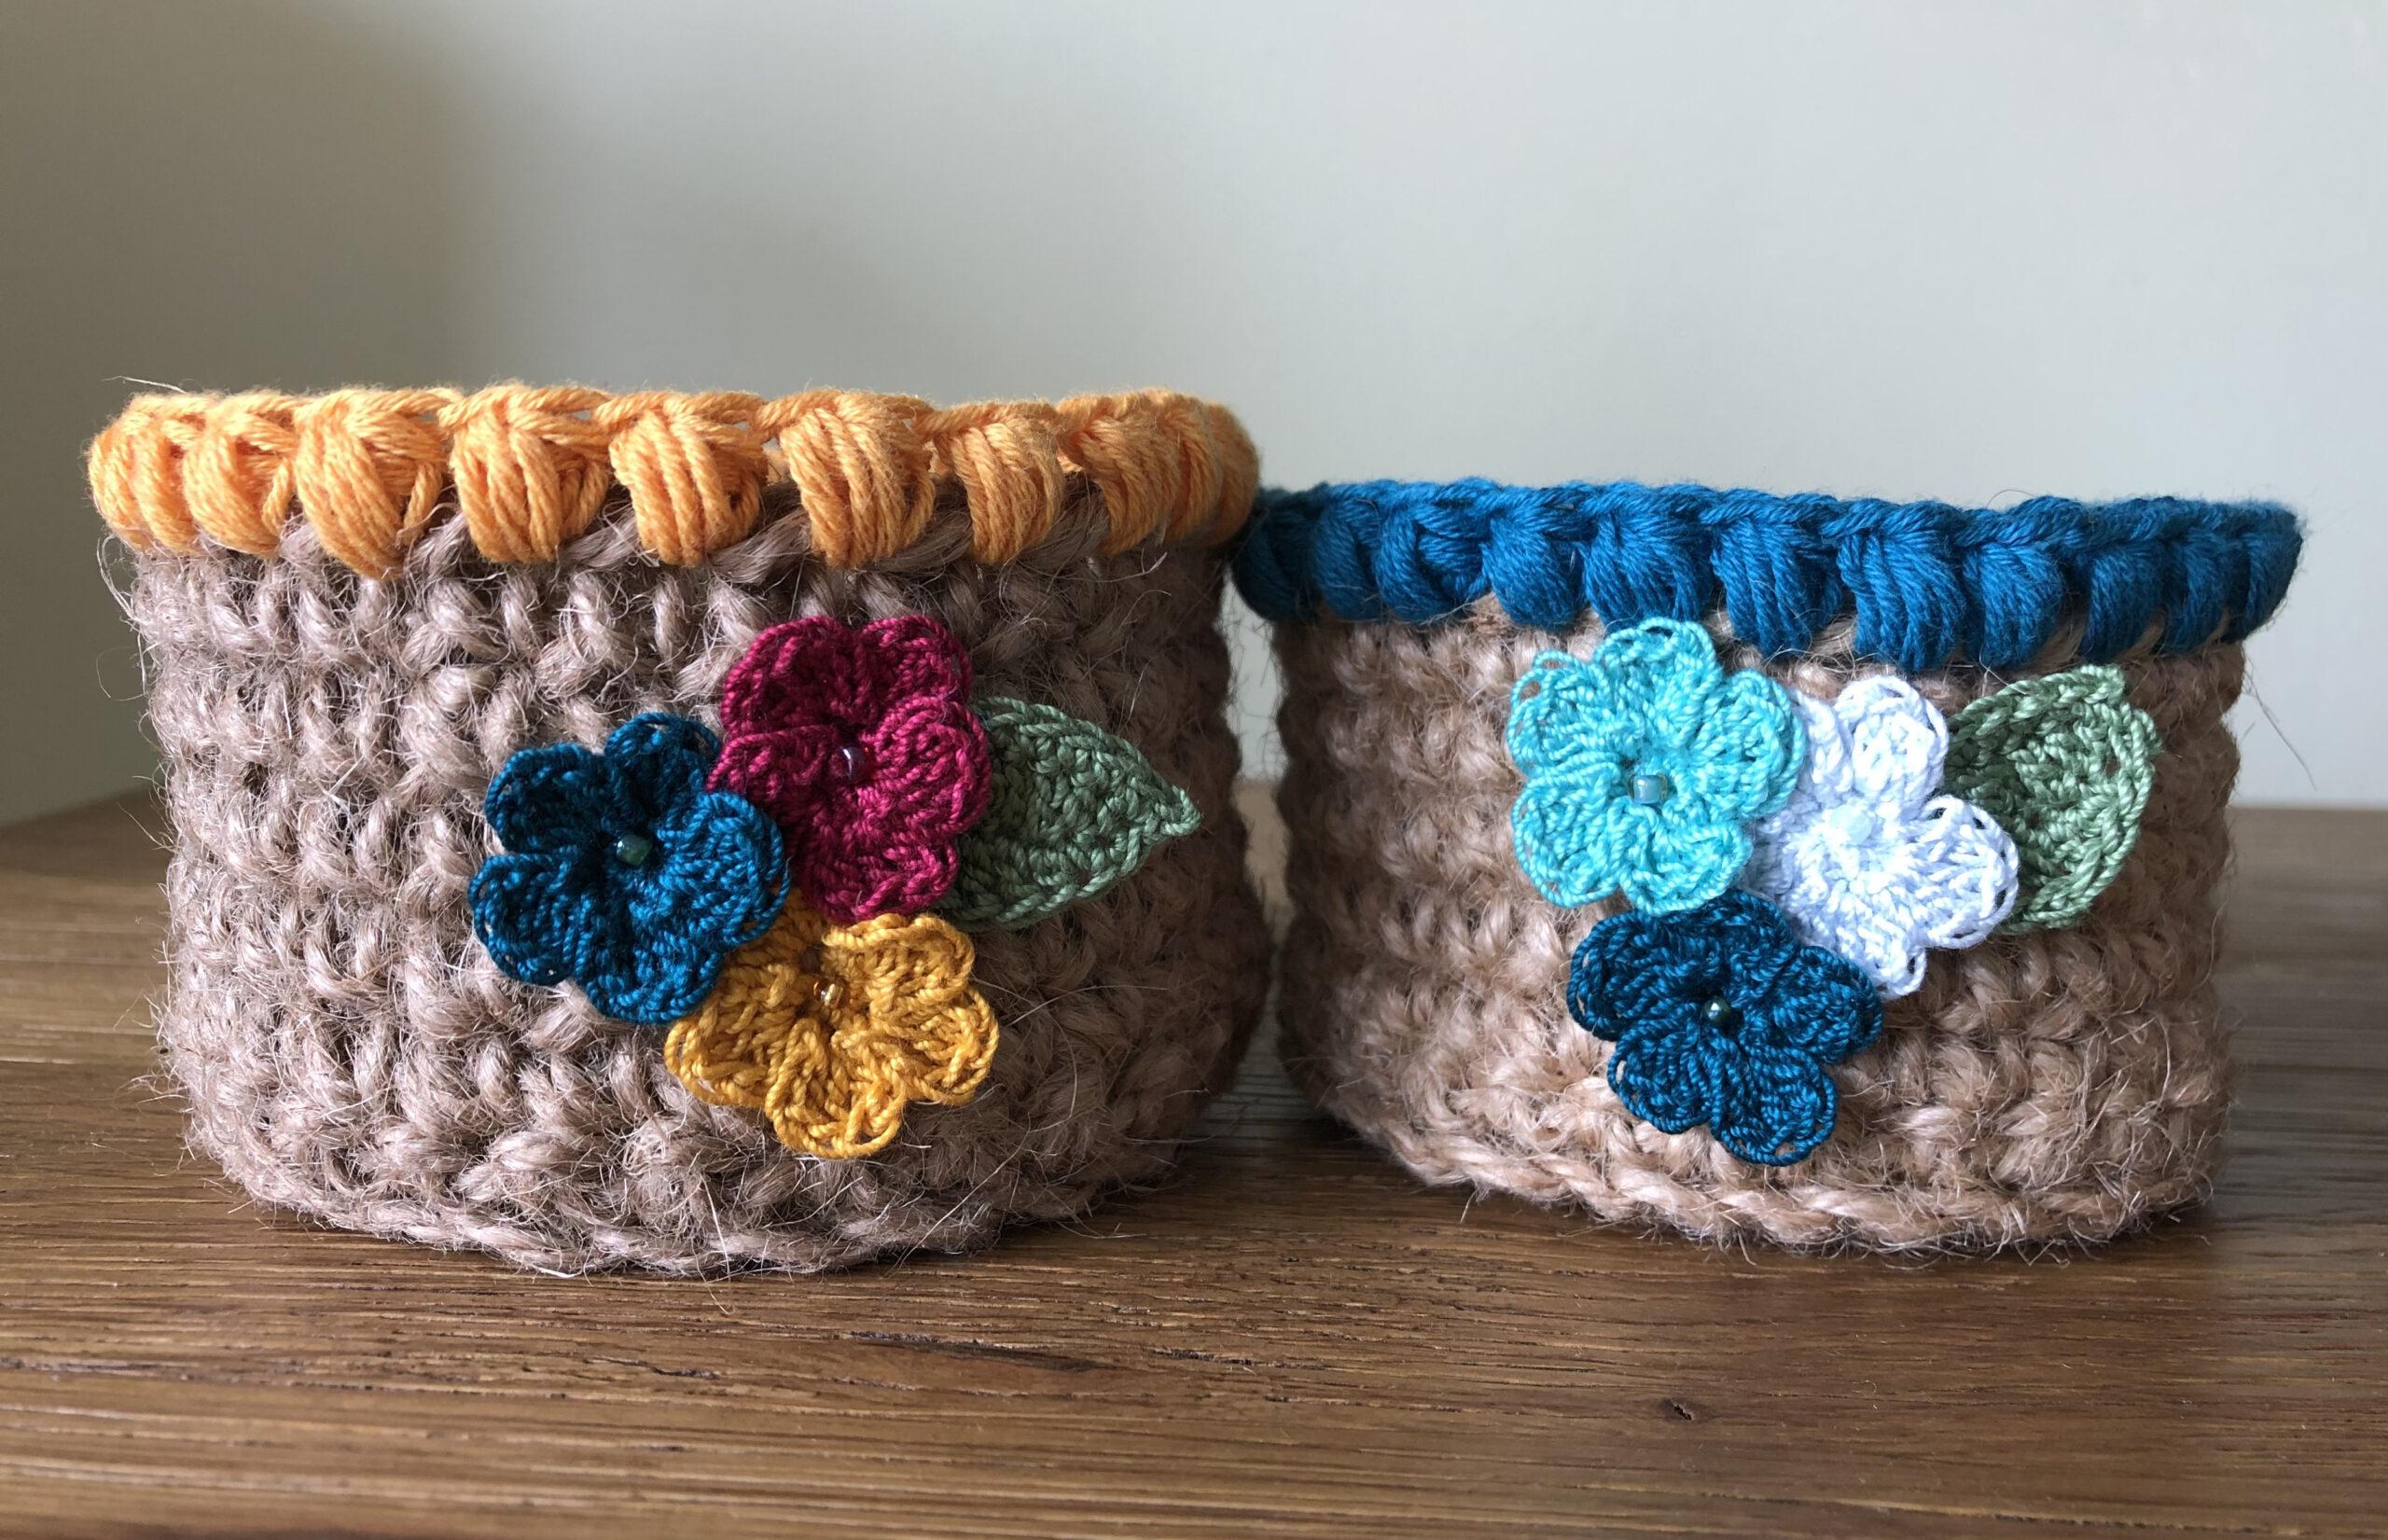 Nesting jute storage baskets.